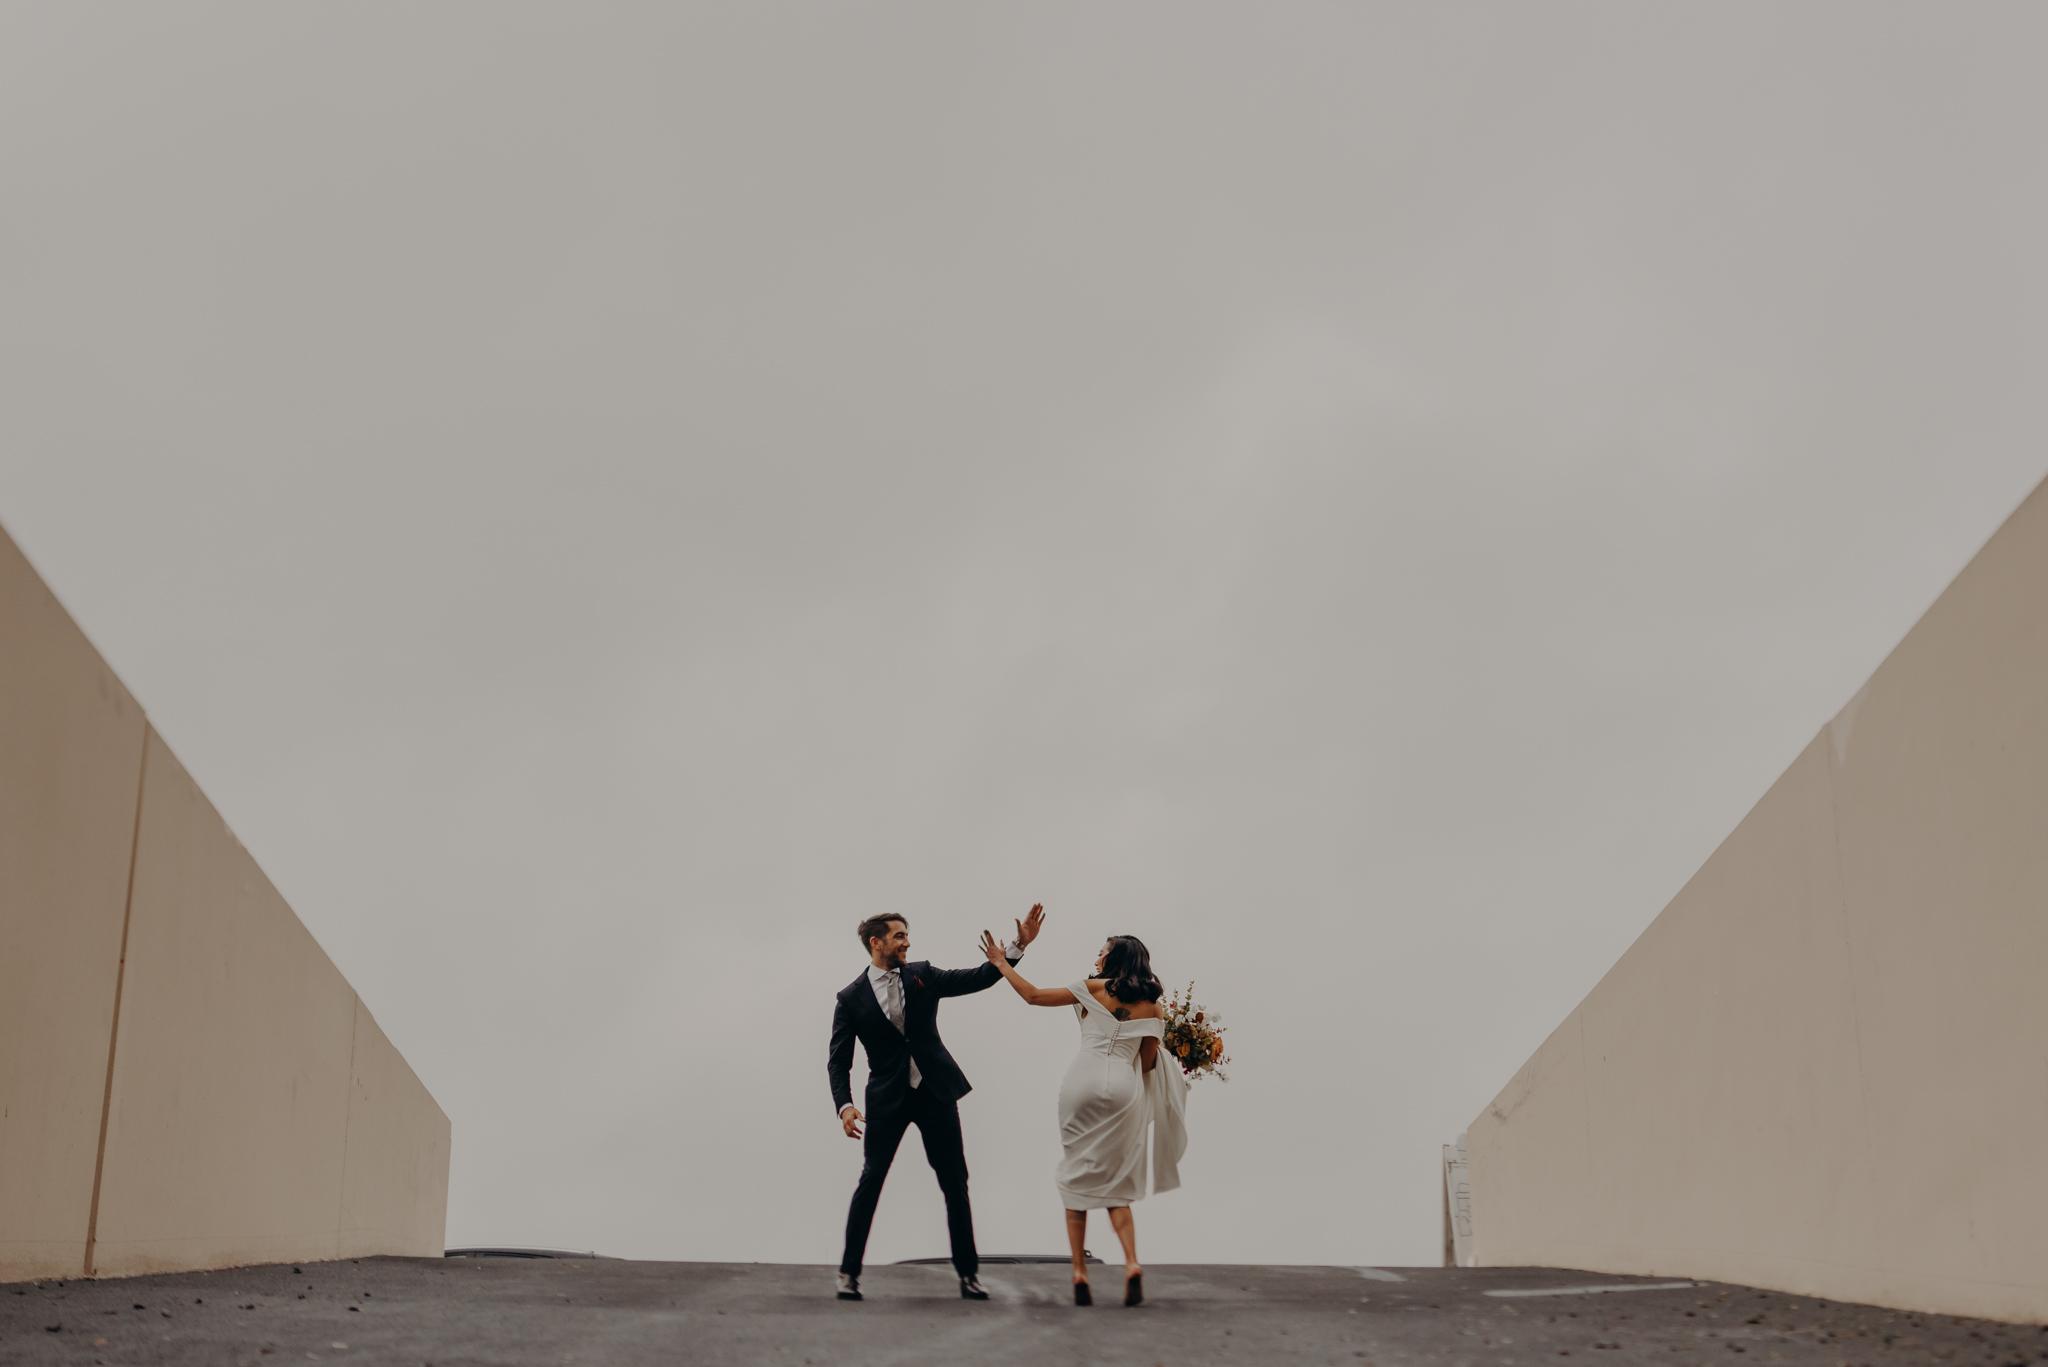 Wedding Photo LA - wedding photographer in los angeles - millwick wedding venue -isaiahandtaylor.com-081.jpg